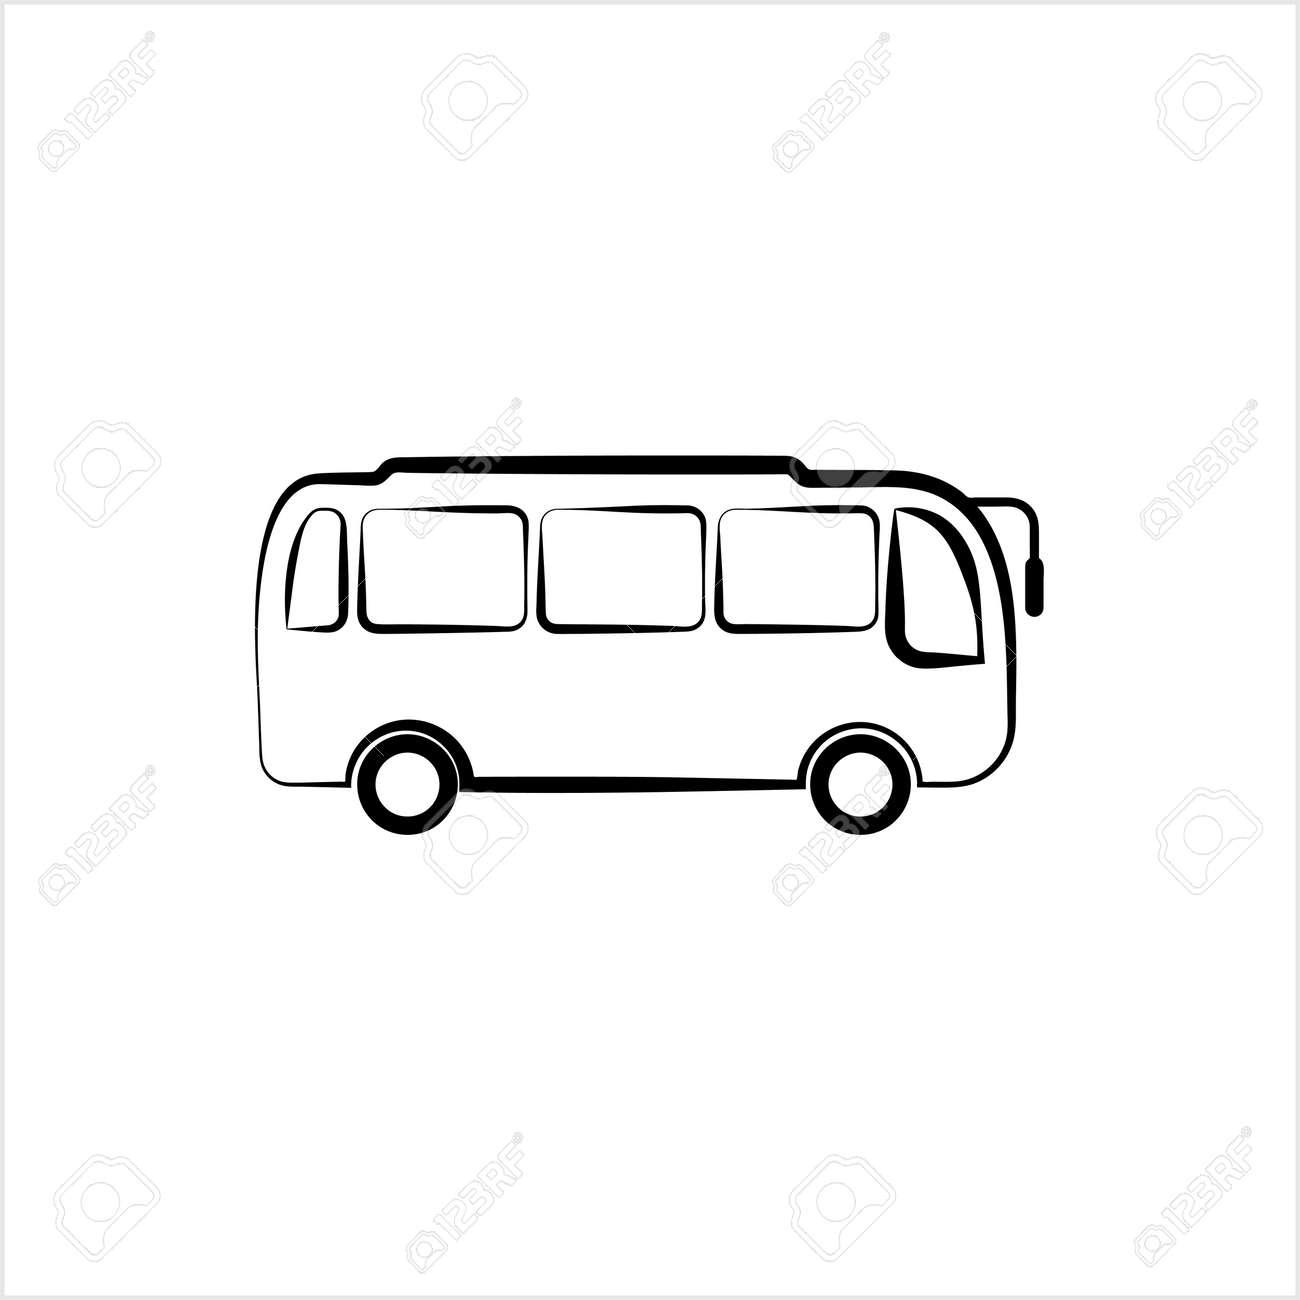 Bus Icon, Bus Vector Art Illustration - 148095305